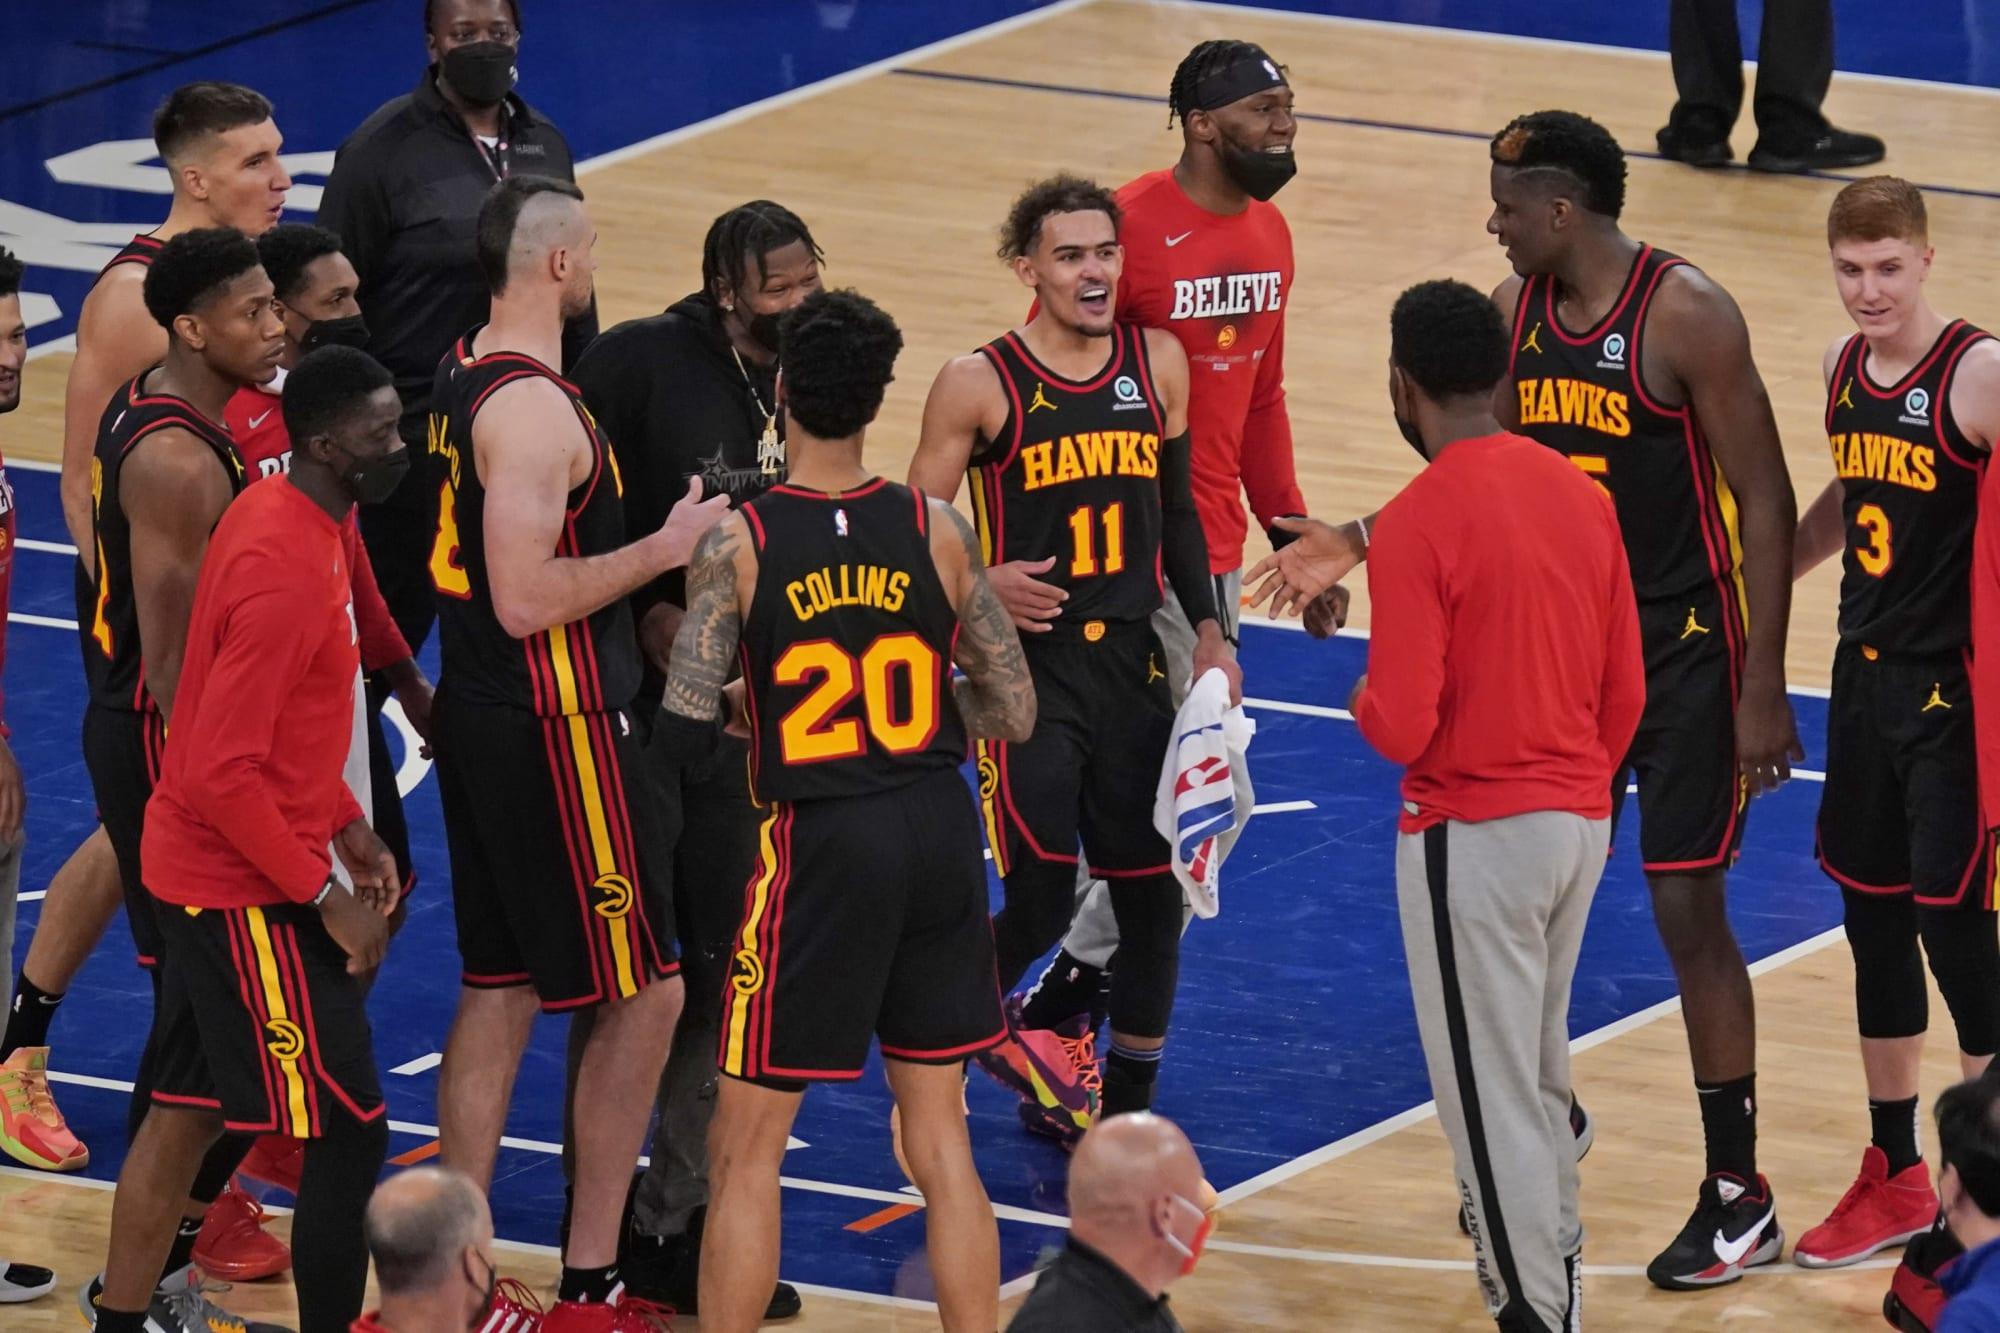 NBA <b>Twitter</b> lost its mind over Trae Young's game-winning shot vs. Knicks thumbnail